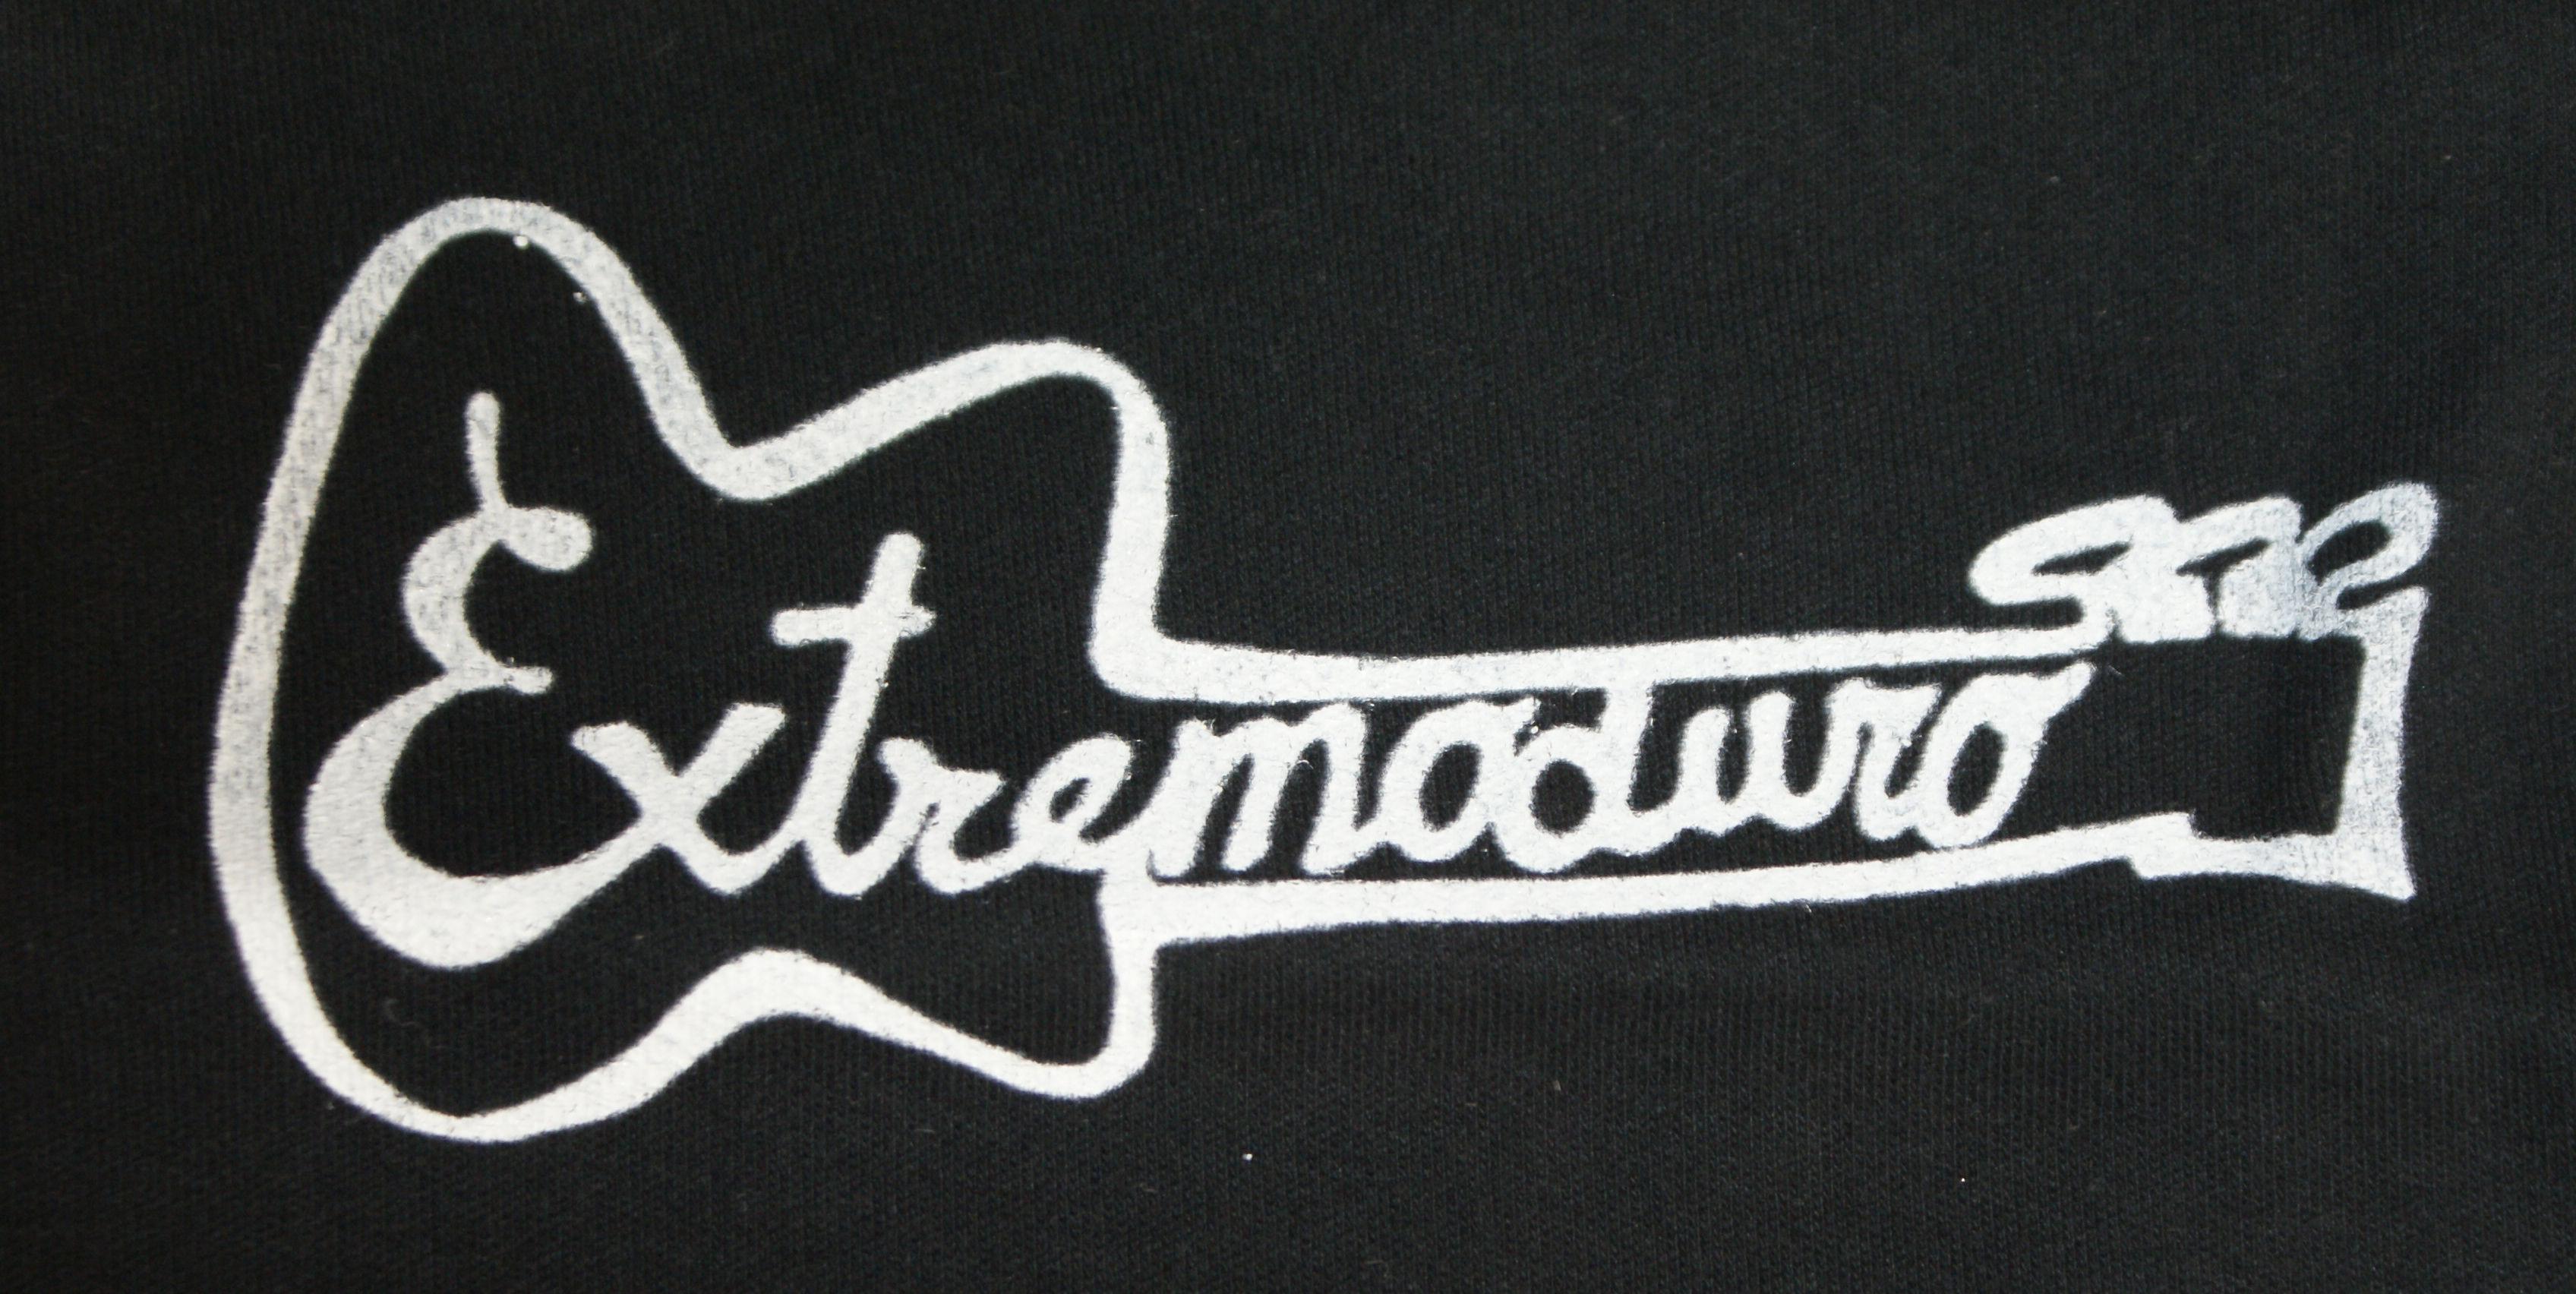 3507 - ¿Cuánto sabes sobre Extremoduro?